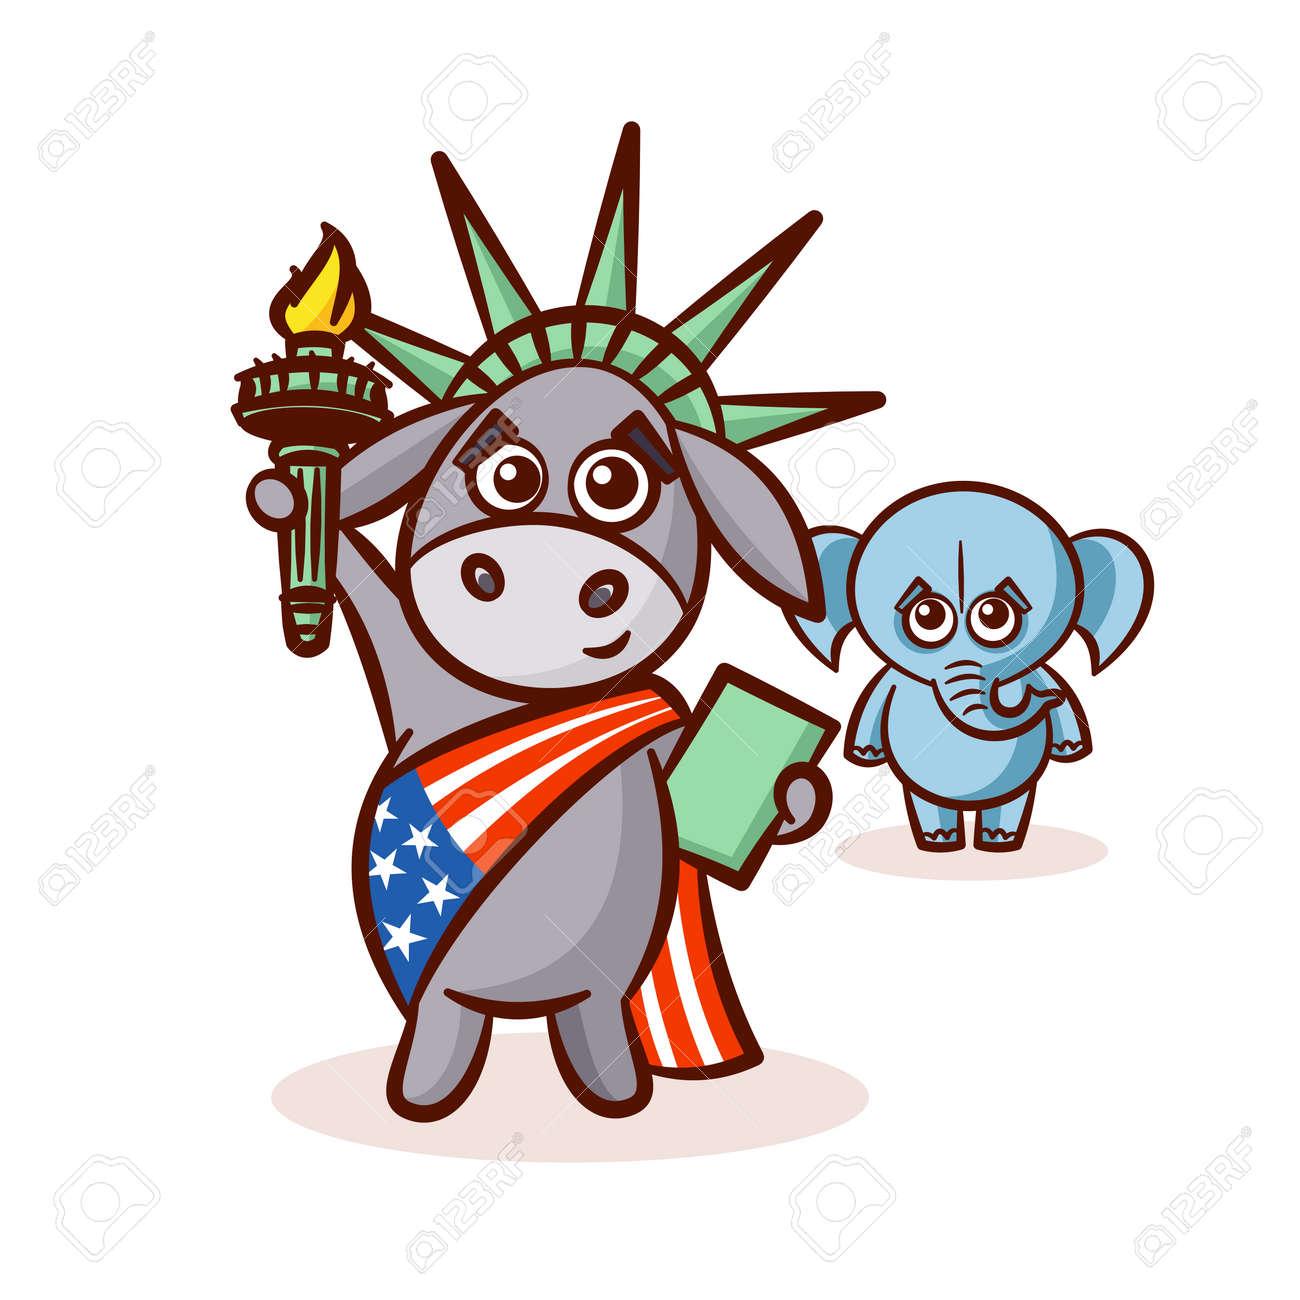 Elephant and donkey symbols of democrats and republicans symbols of democrats and republicans political parties in united states buycottarizona